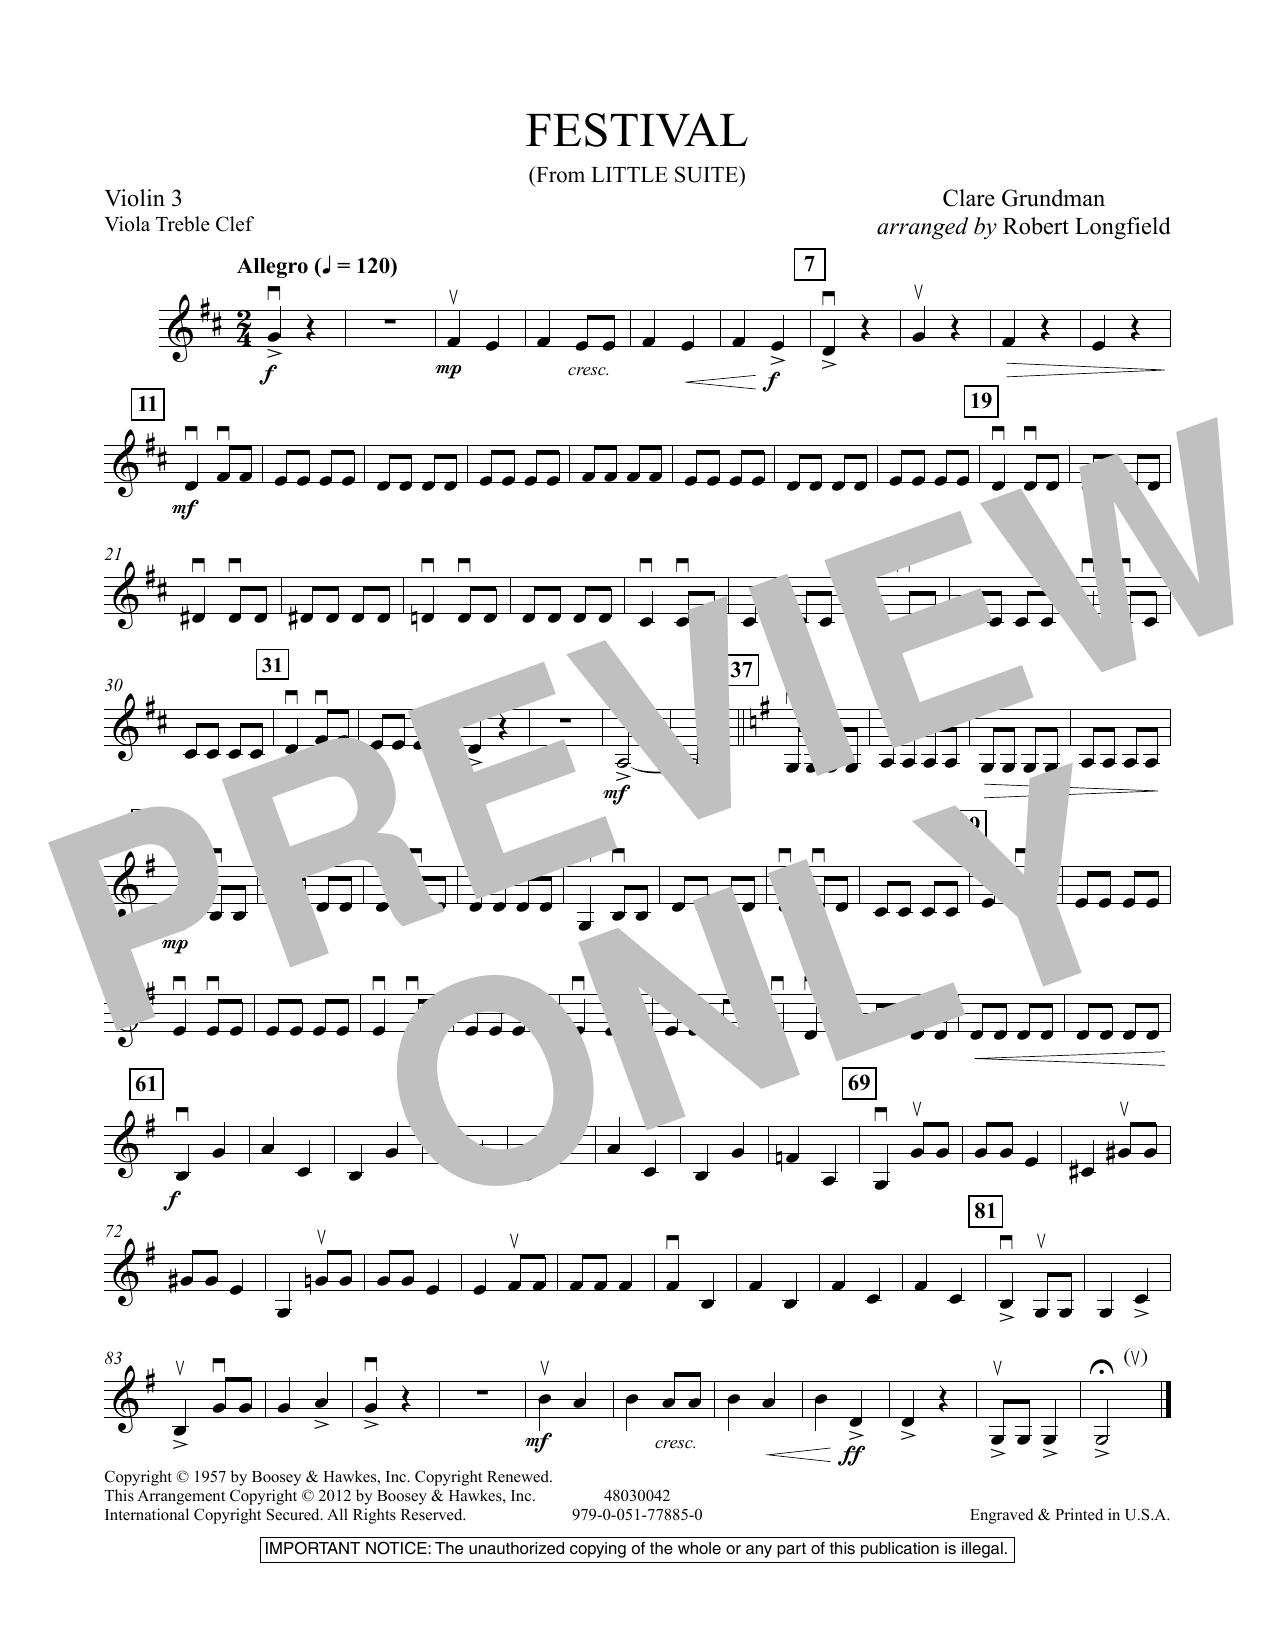 Festival (from Little Suite) - Violin 3 (Viola Treble Clef) Sheet Music